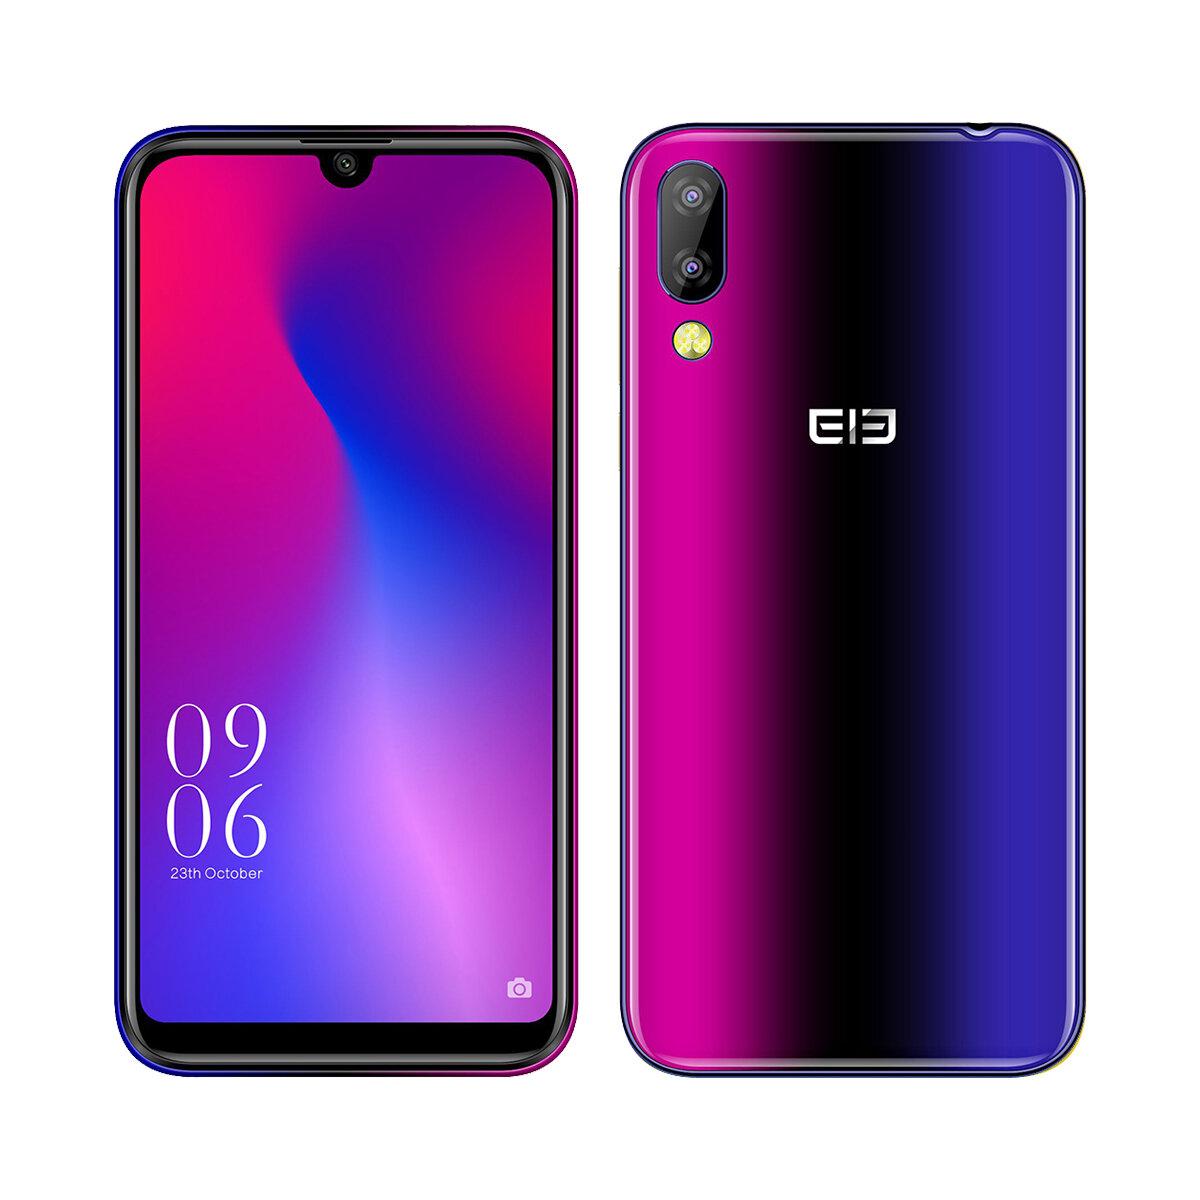 Telefon Elephone A6 Mini 69,99$